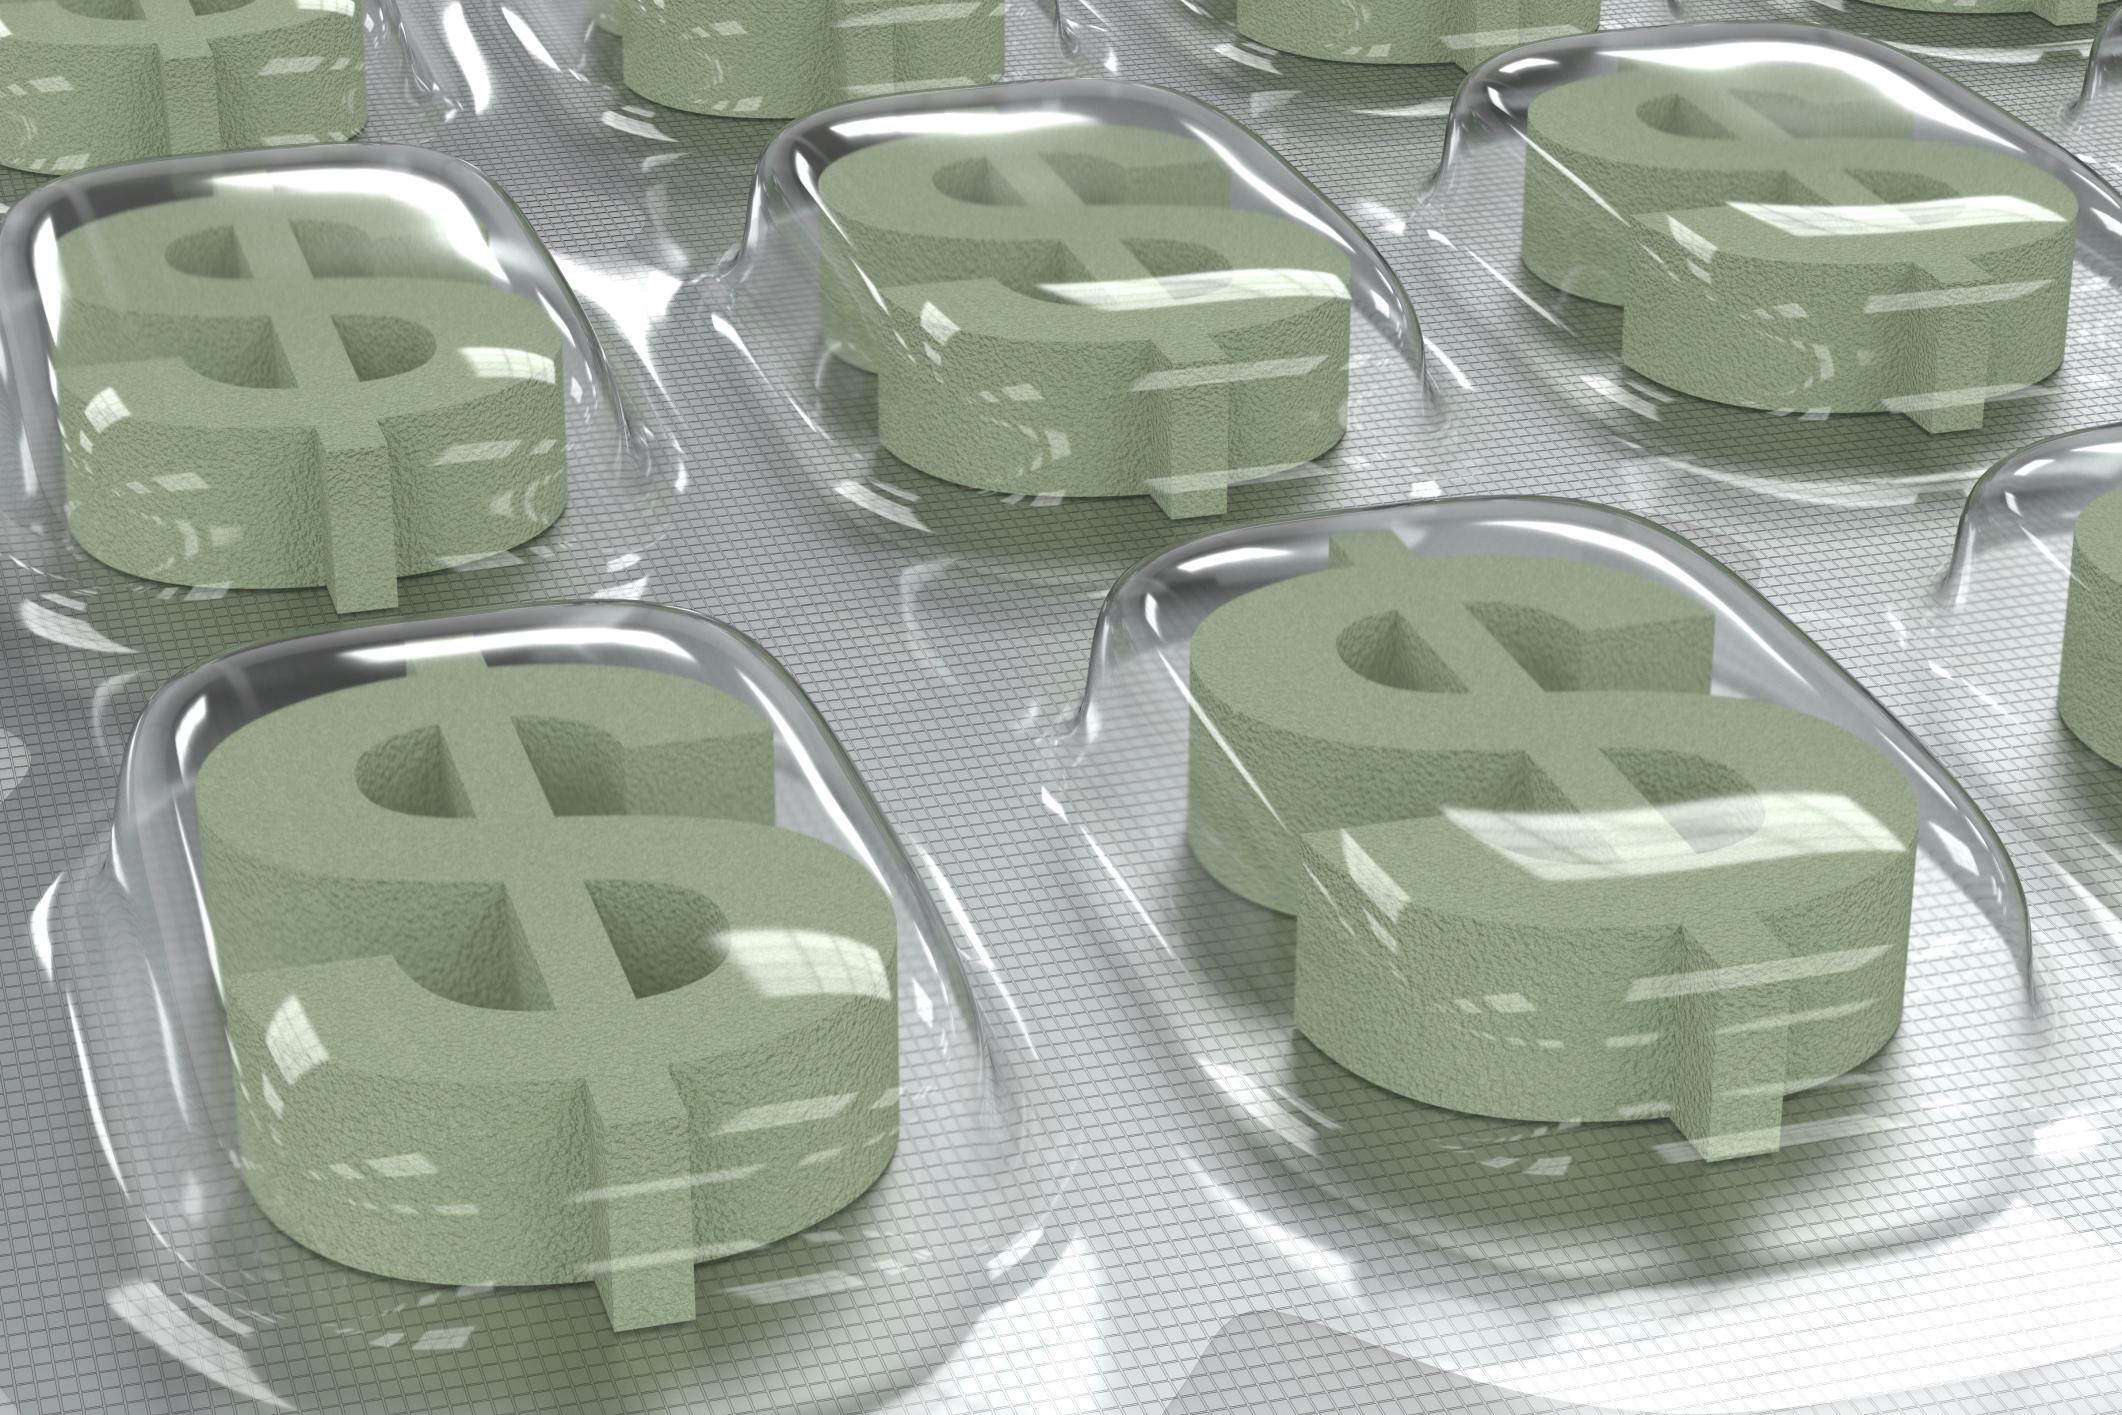 Blister pack full of dollar signs instead of pills.